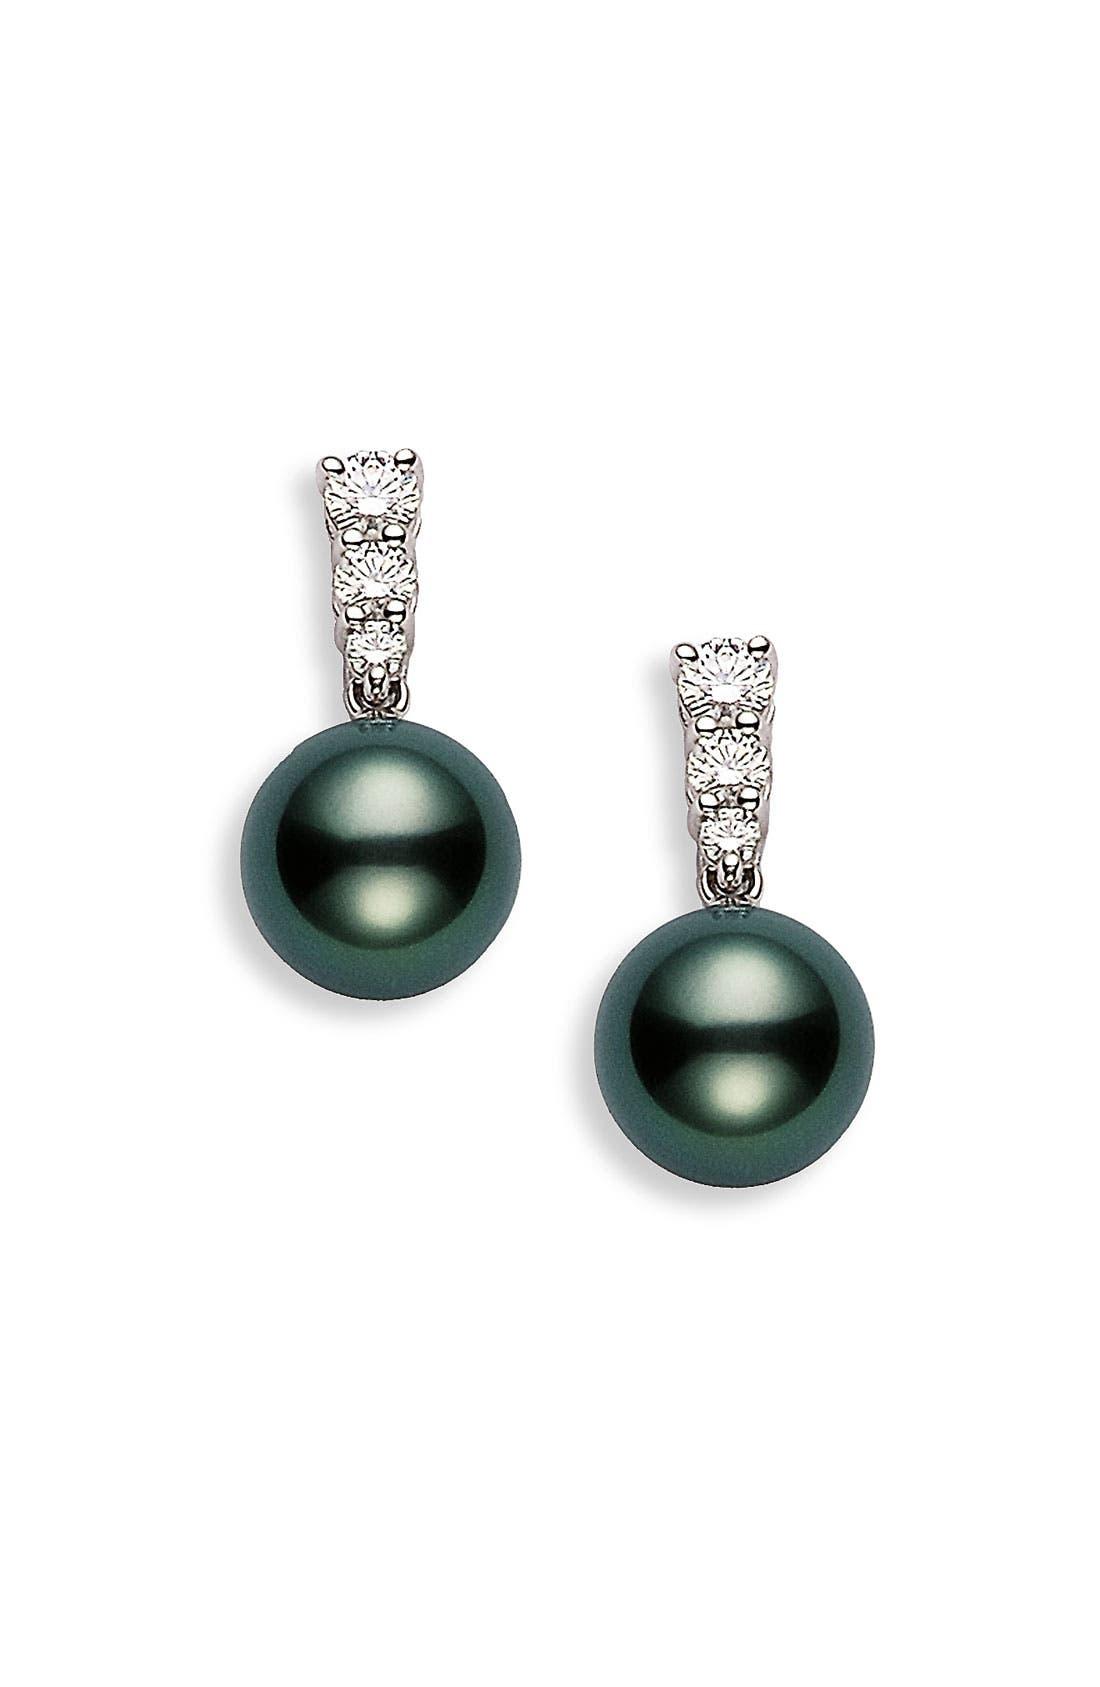 Main Image - Mikimoto 'Morning Dew' Black South Sea Cultured Pearl & Diamond Earrings